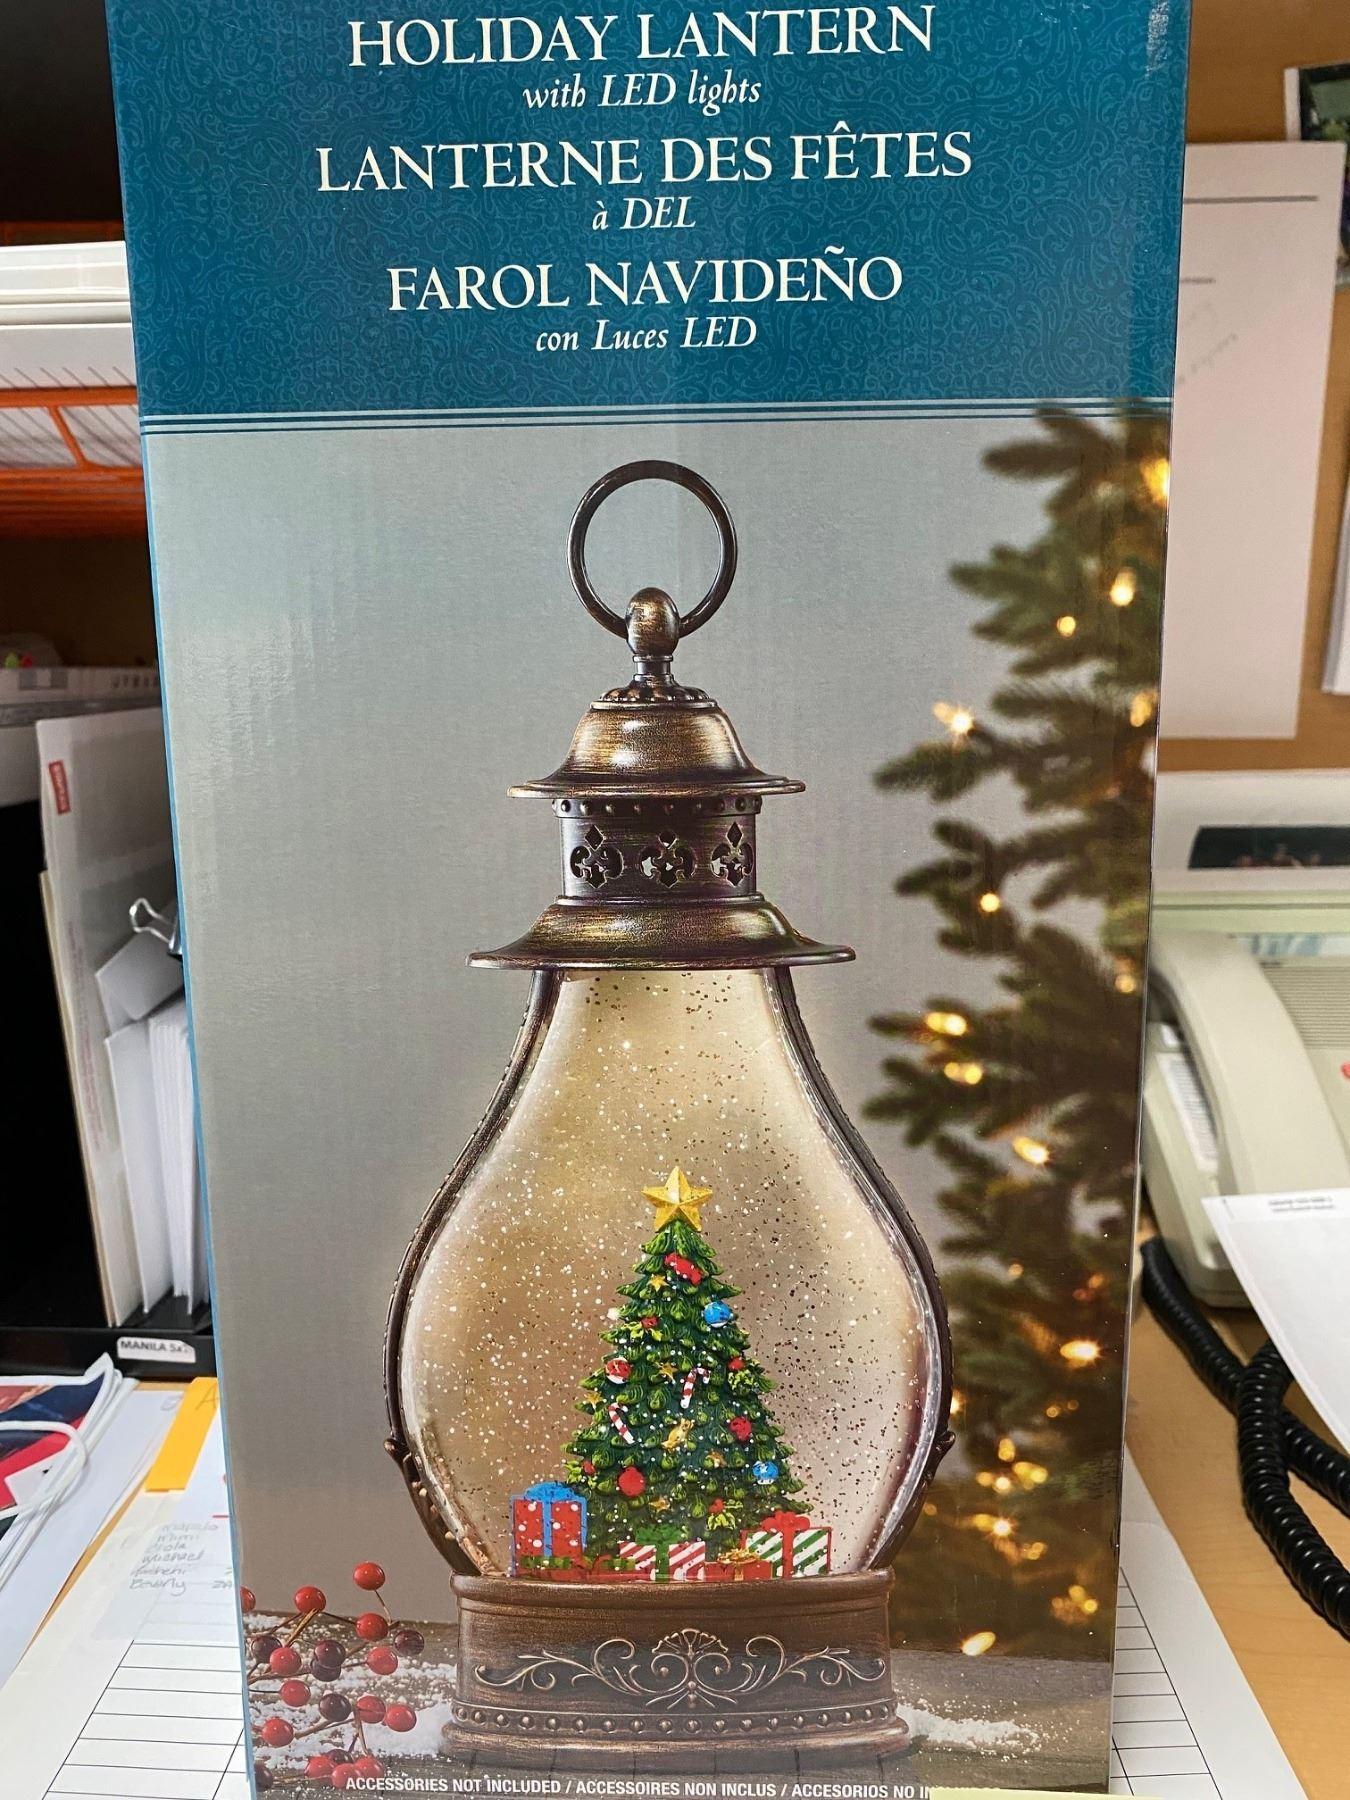 Holiday Lantern with LED Lights